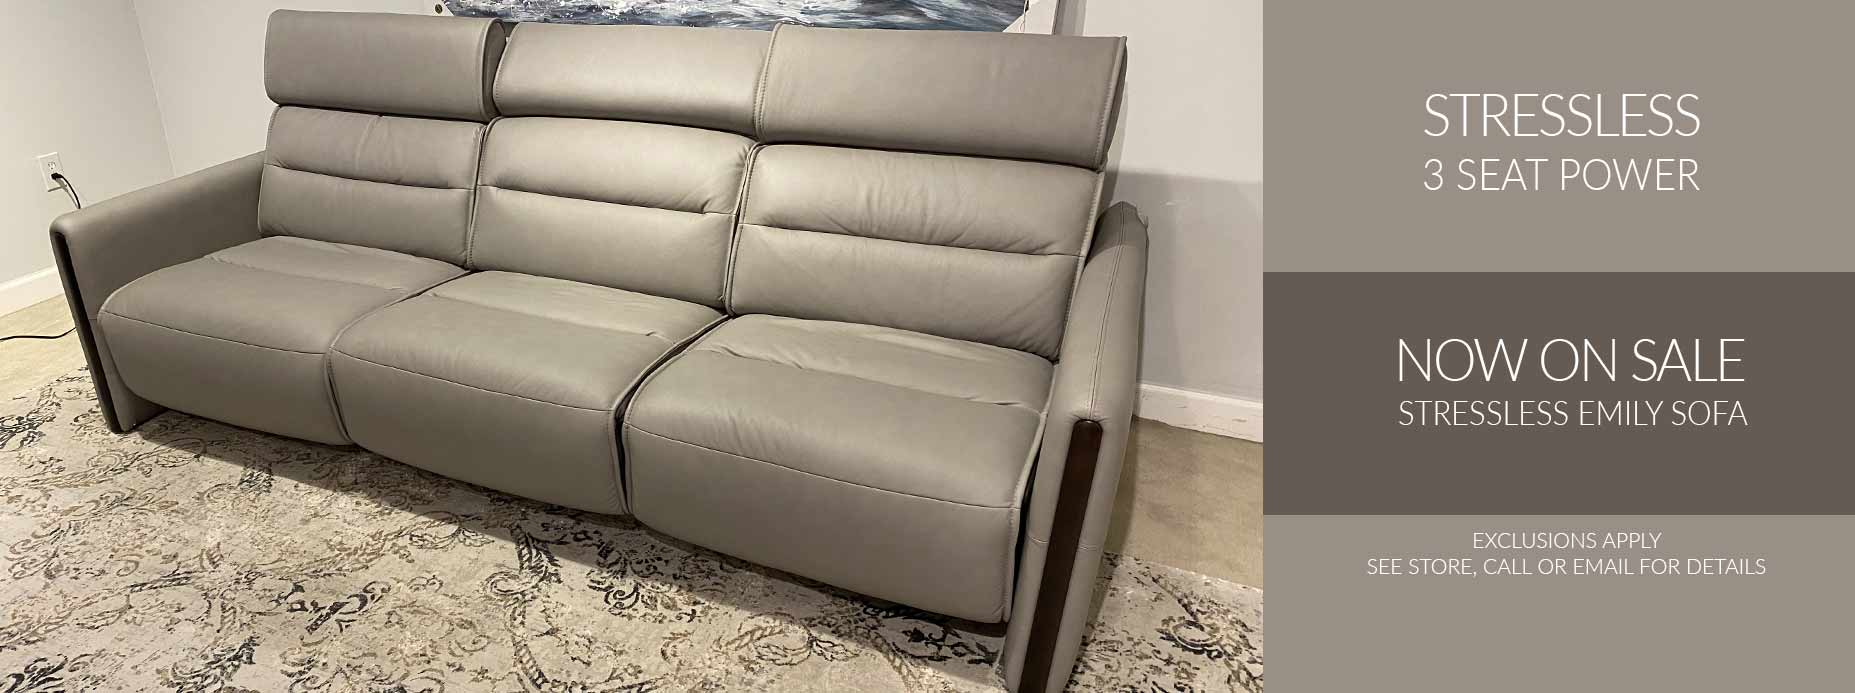 Stressless 3 Seat Power Sofa